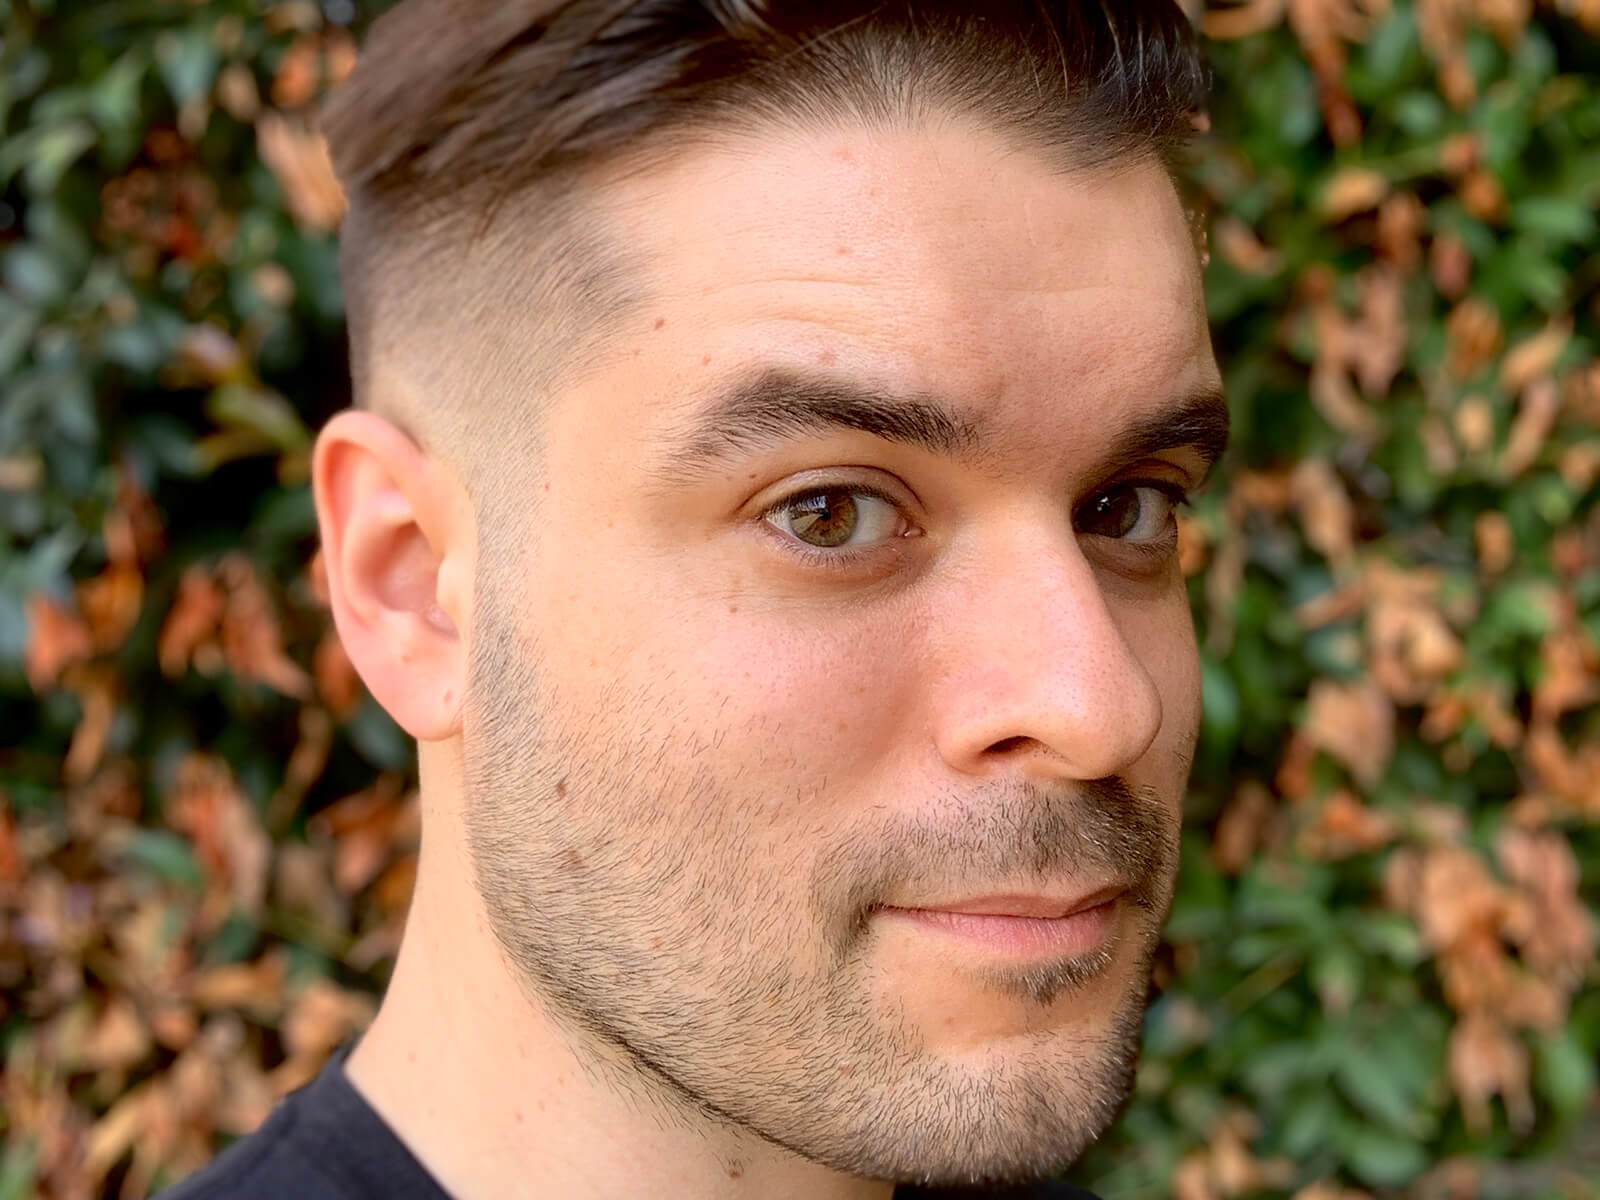 A headshot of DigiPen BFA graduate and Warner Bros. Animation director Cole Harrington.